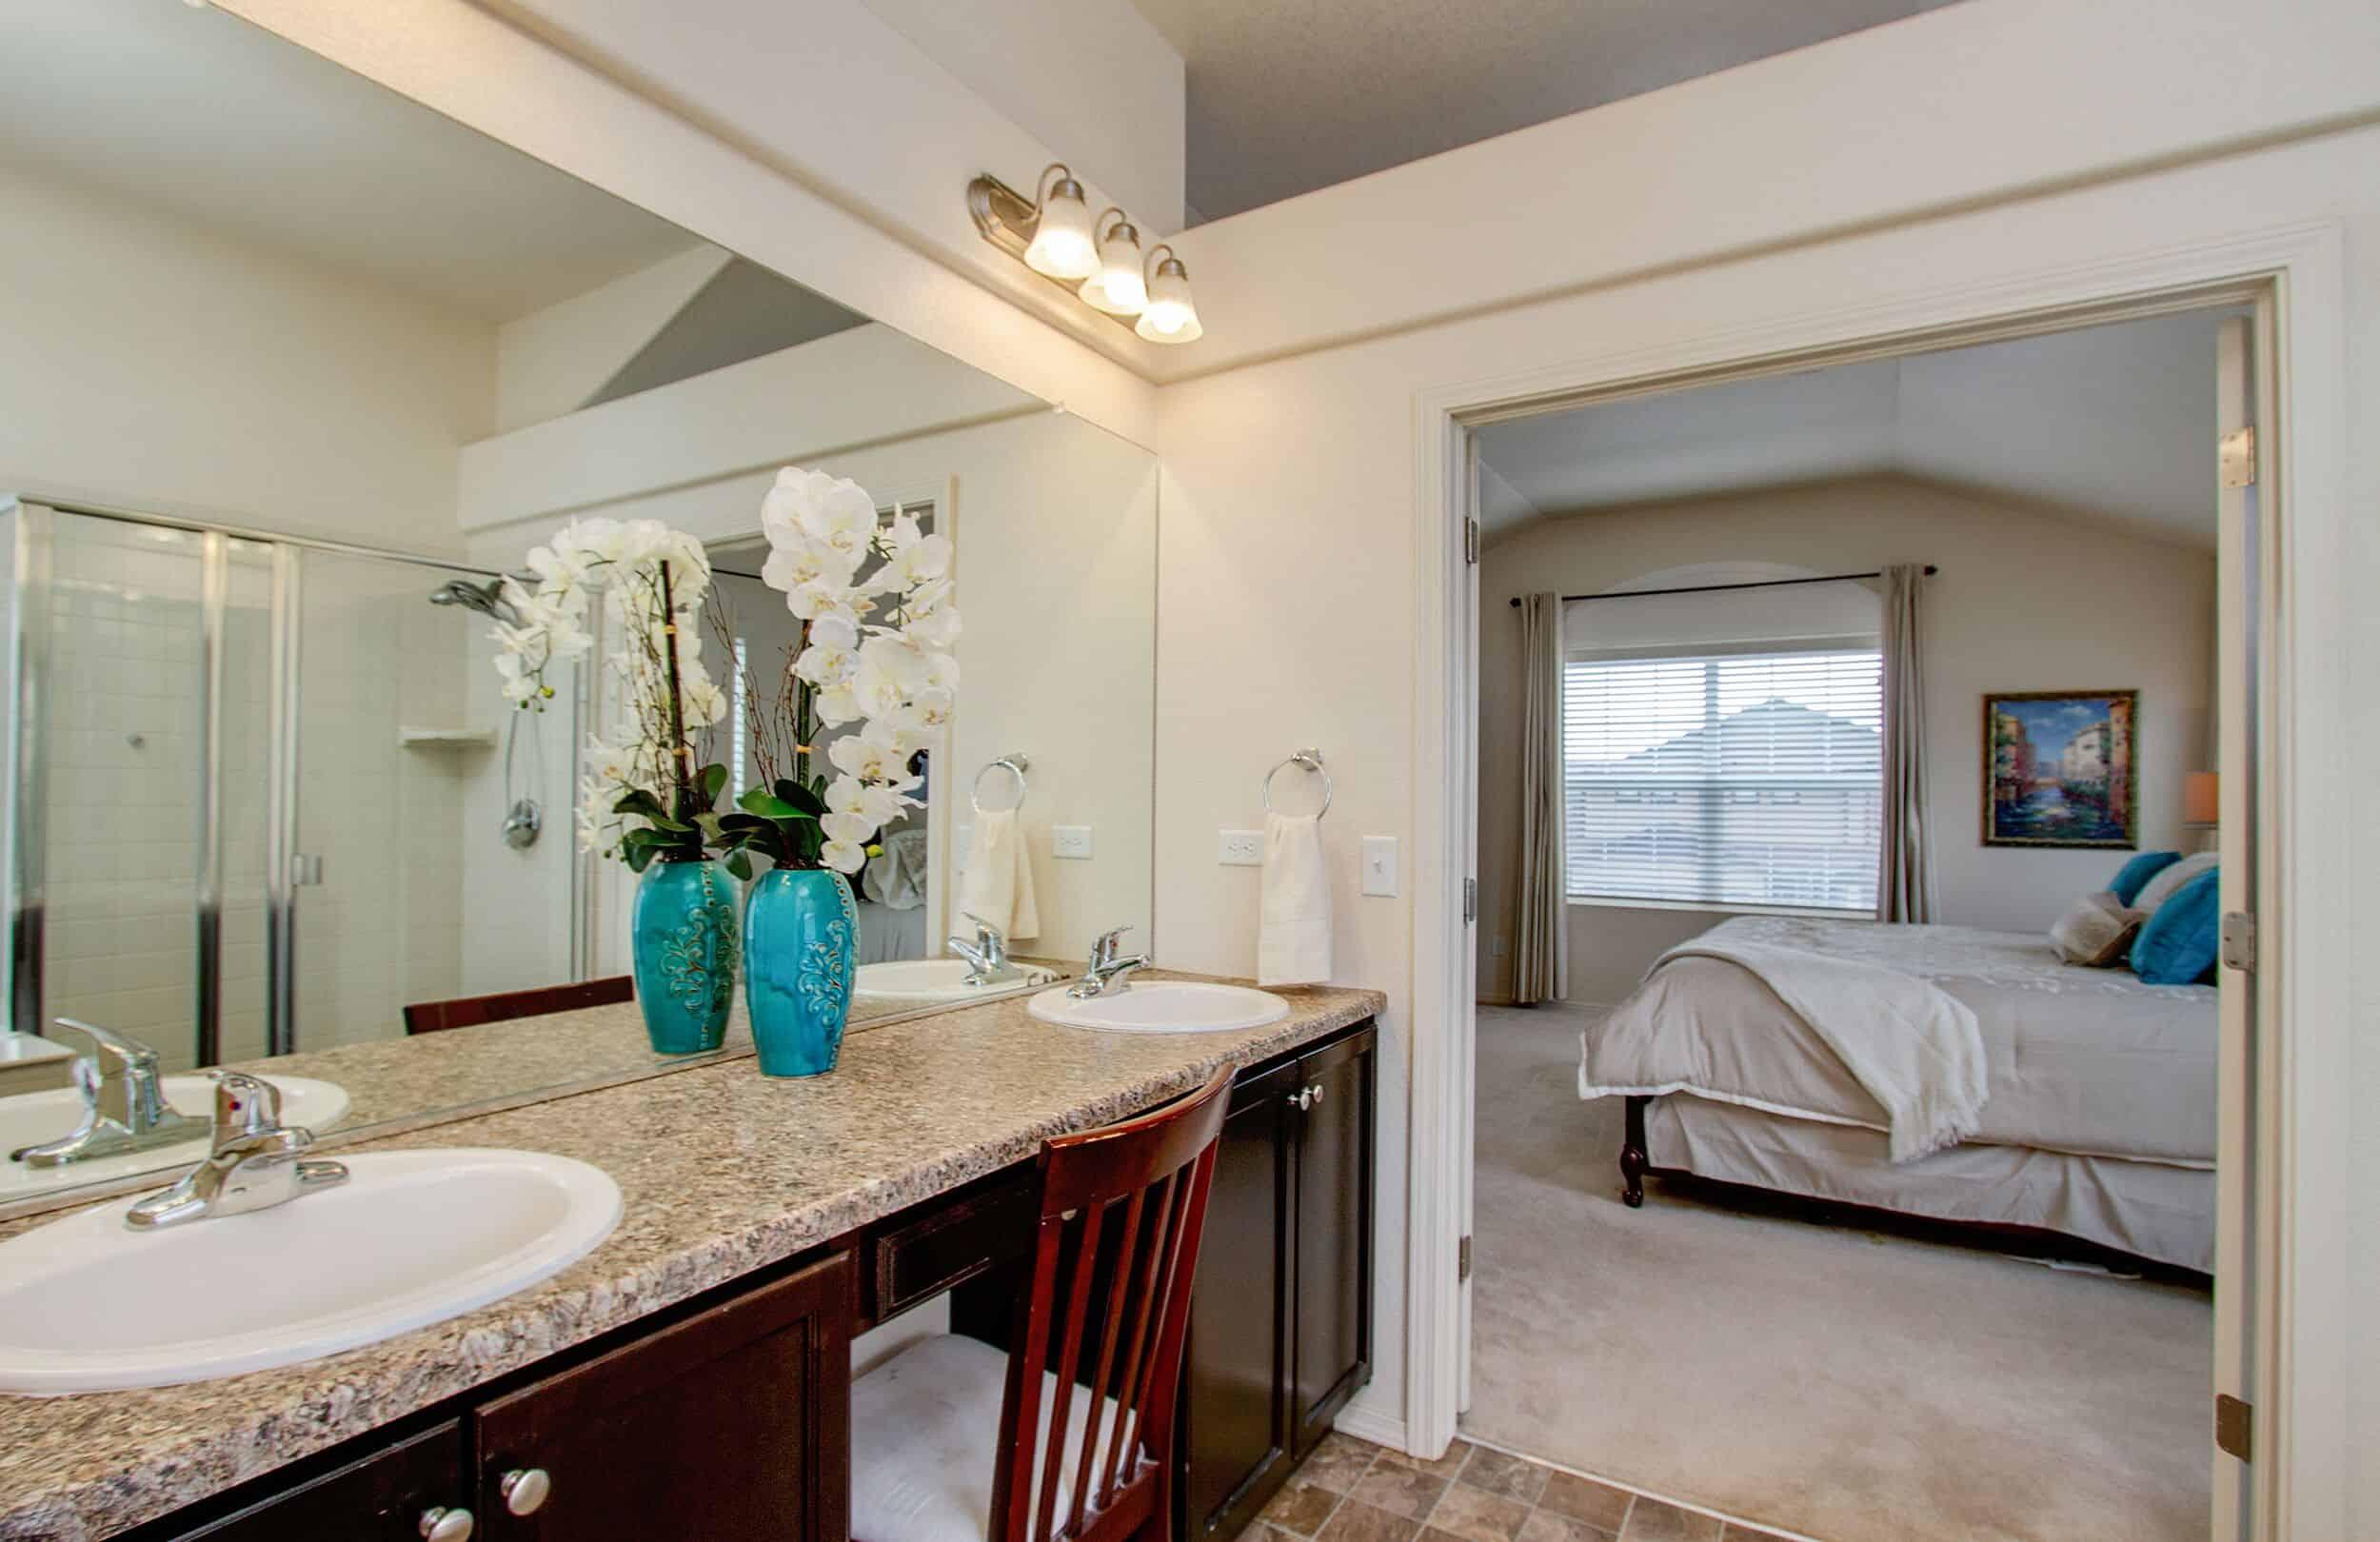 Master Bathroom looking into Master Bedroom